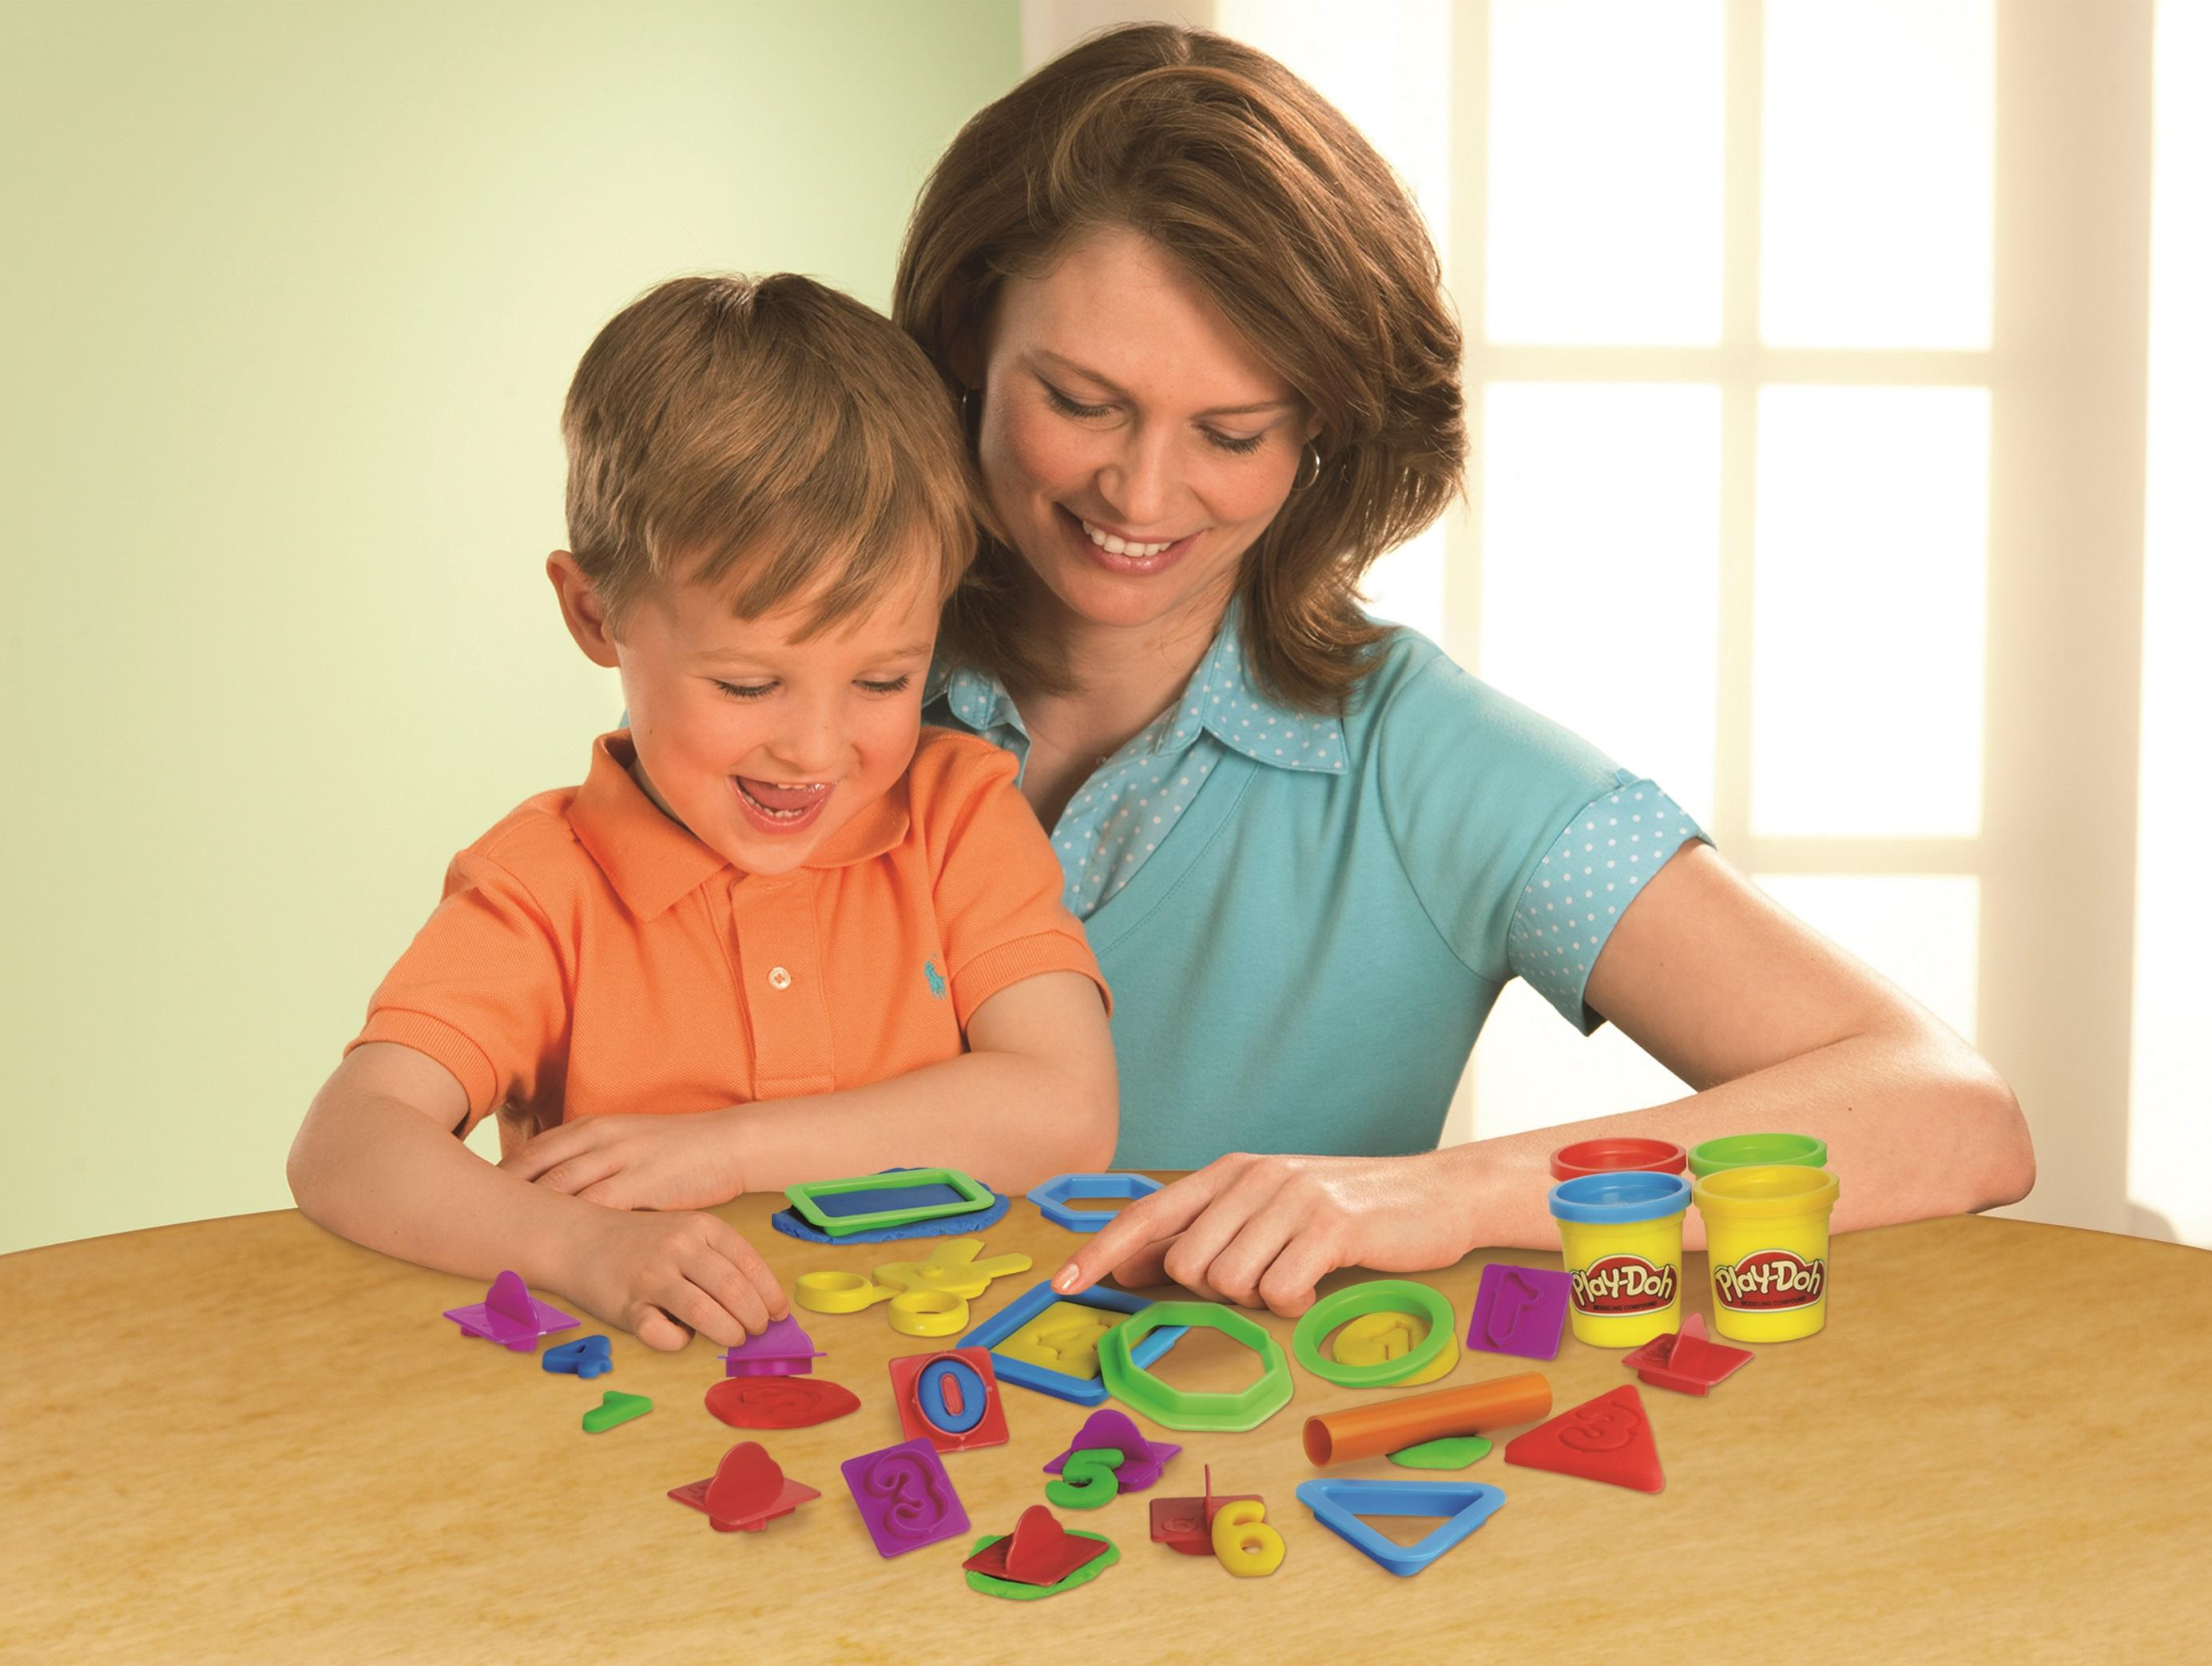 Kinder mit Play-Doh Knete förderm